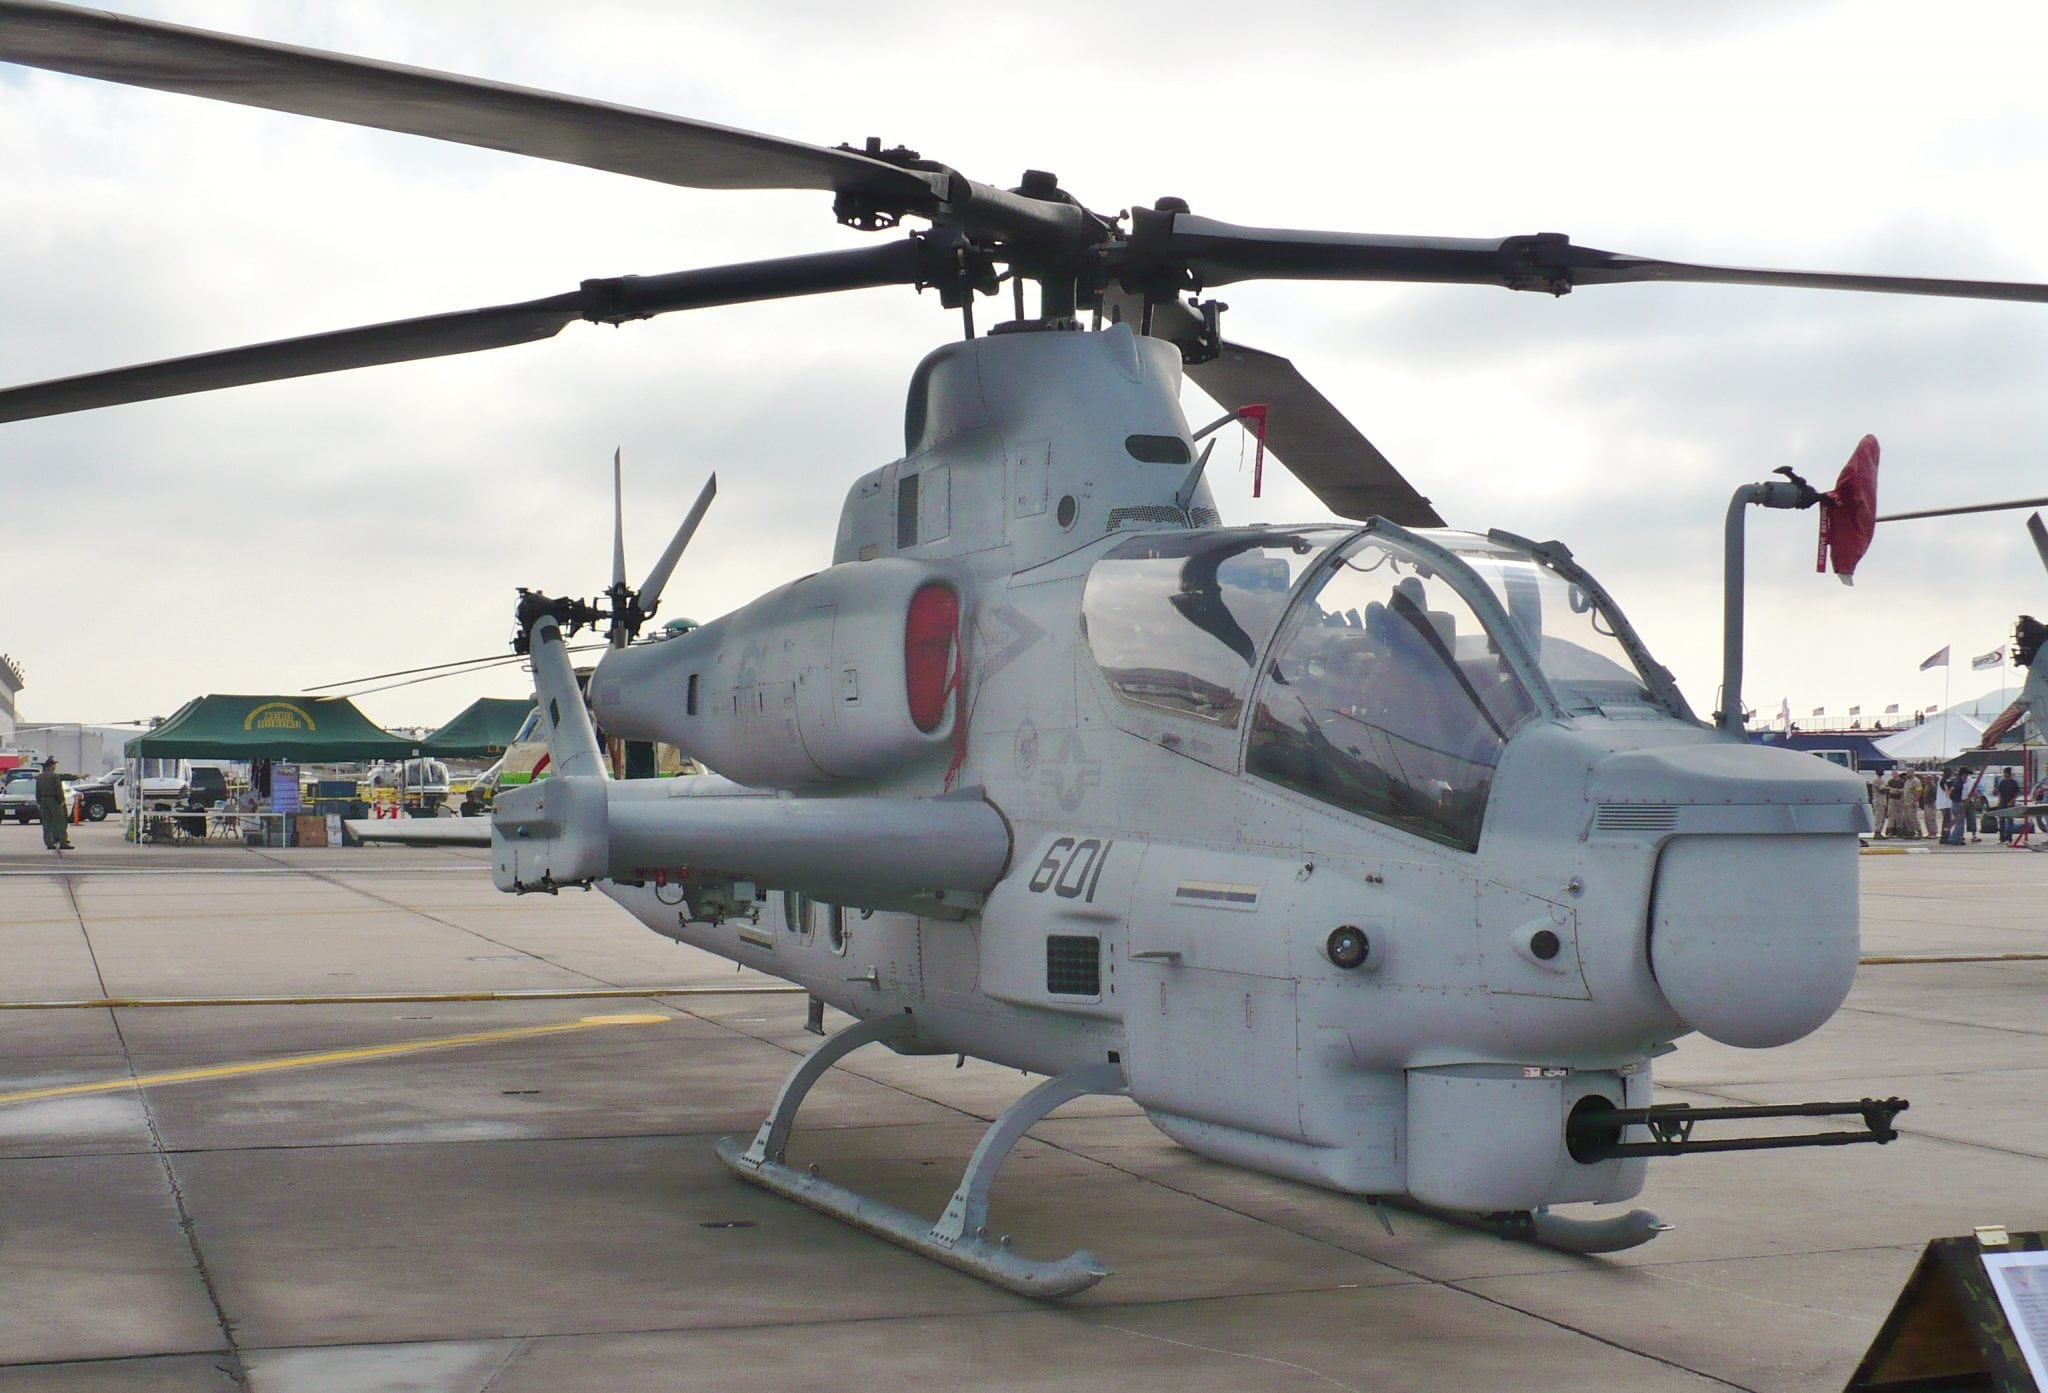 AH-1Z on display at the MCAS Miramar airshow on October 3, 2008.